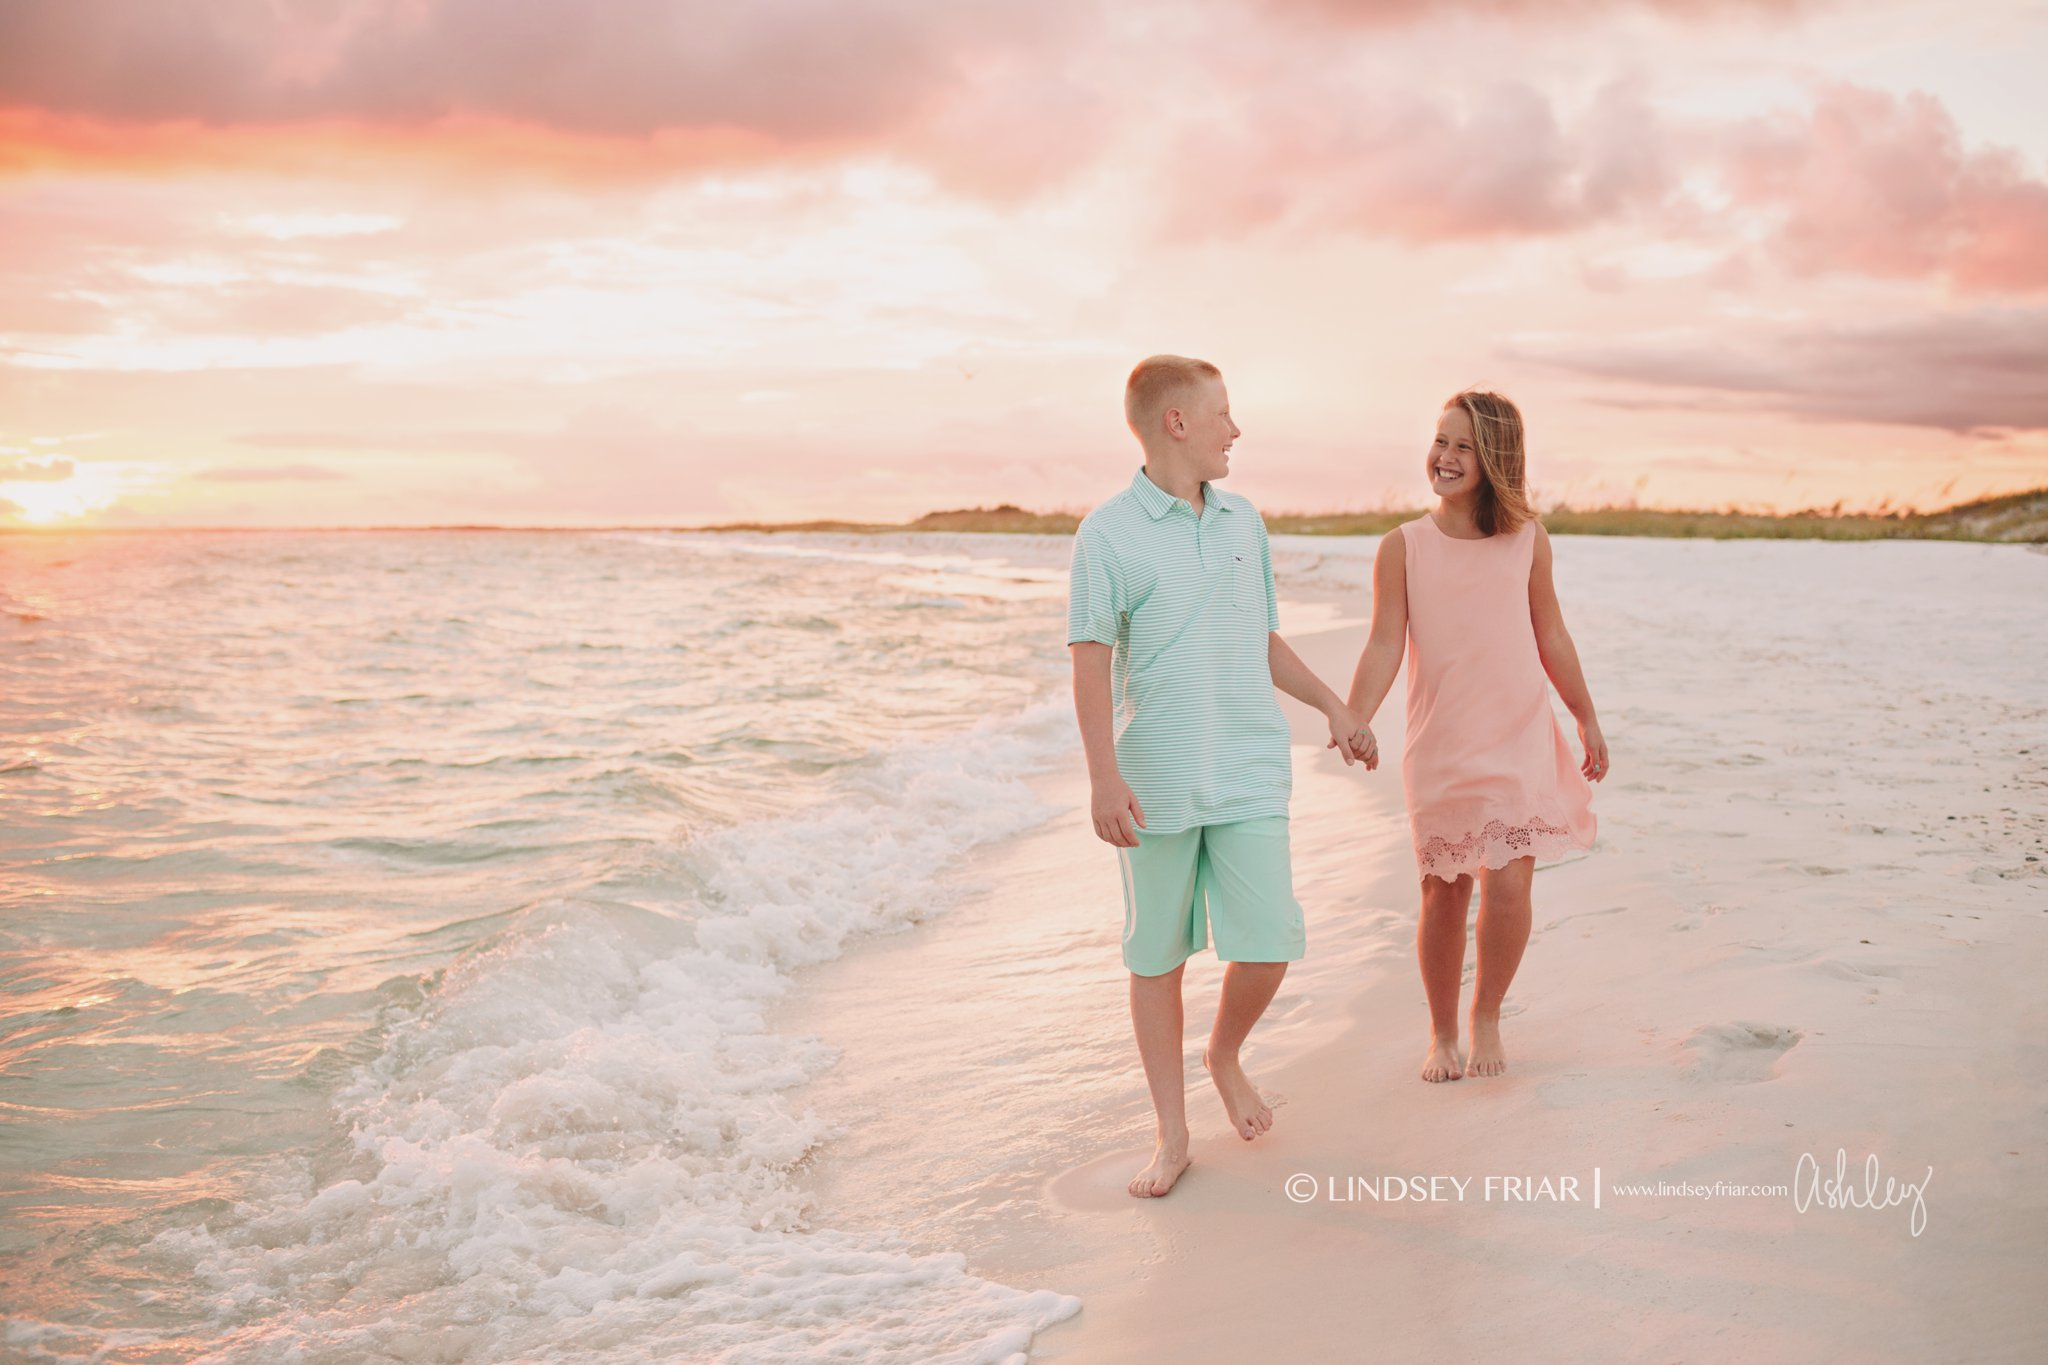 Alberson Pensacola Beach Family Mini Session By Ashley